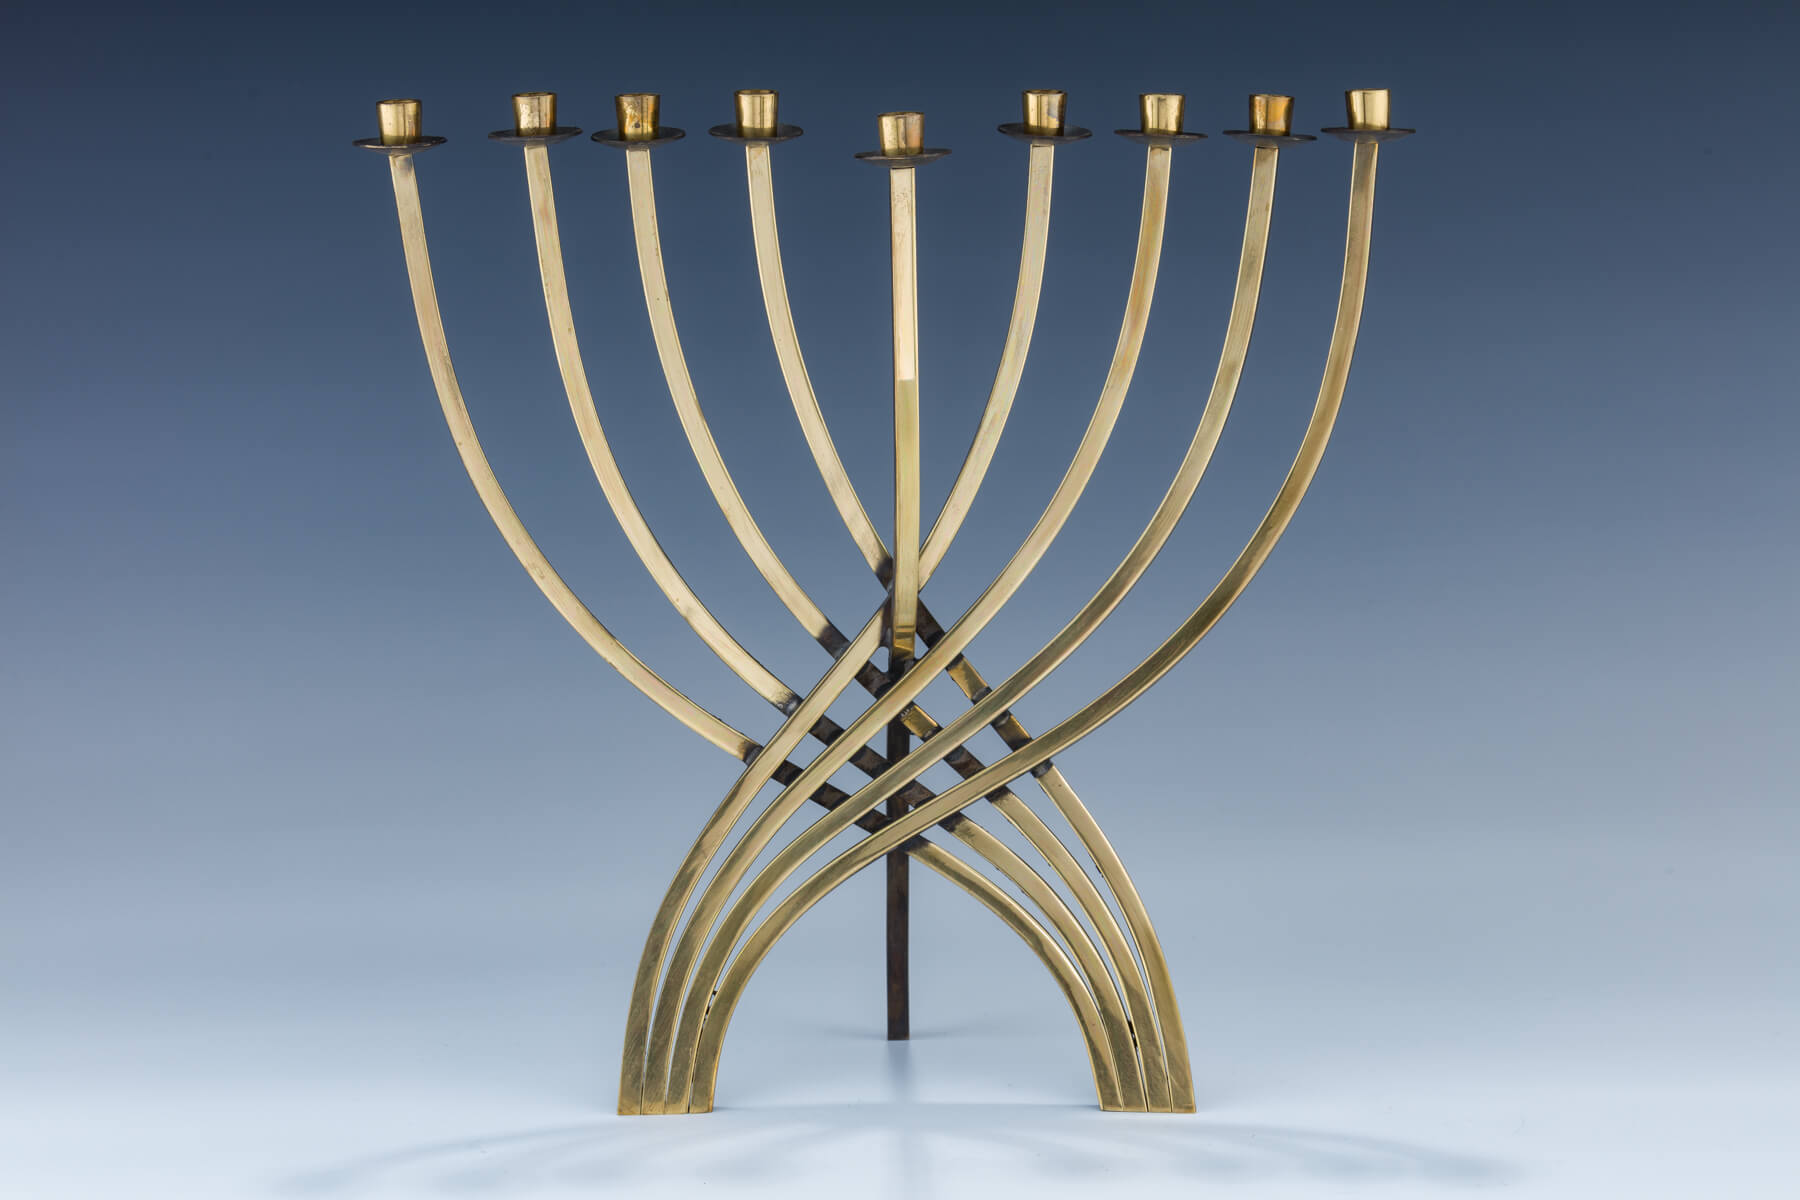 82. A Brass Hanukkah Menorah By Ludwig Wolpert